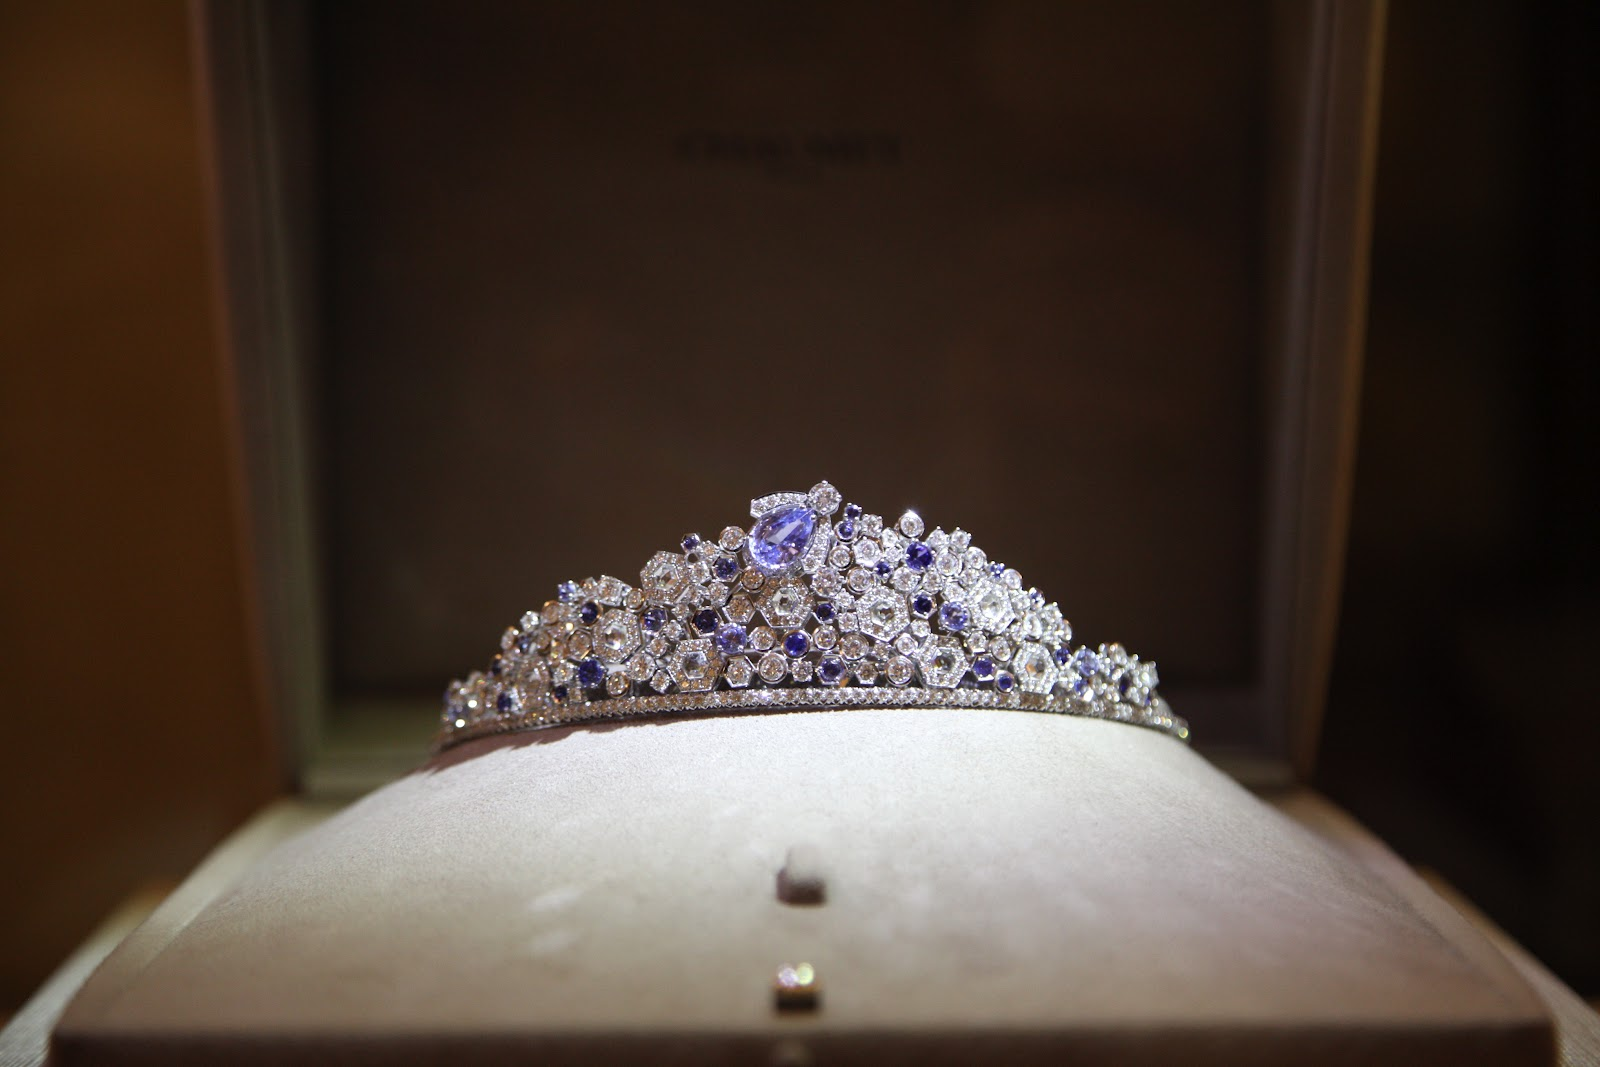 The London Season The Shanghai Jewellery Chaumet